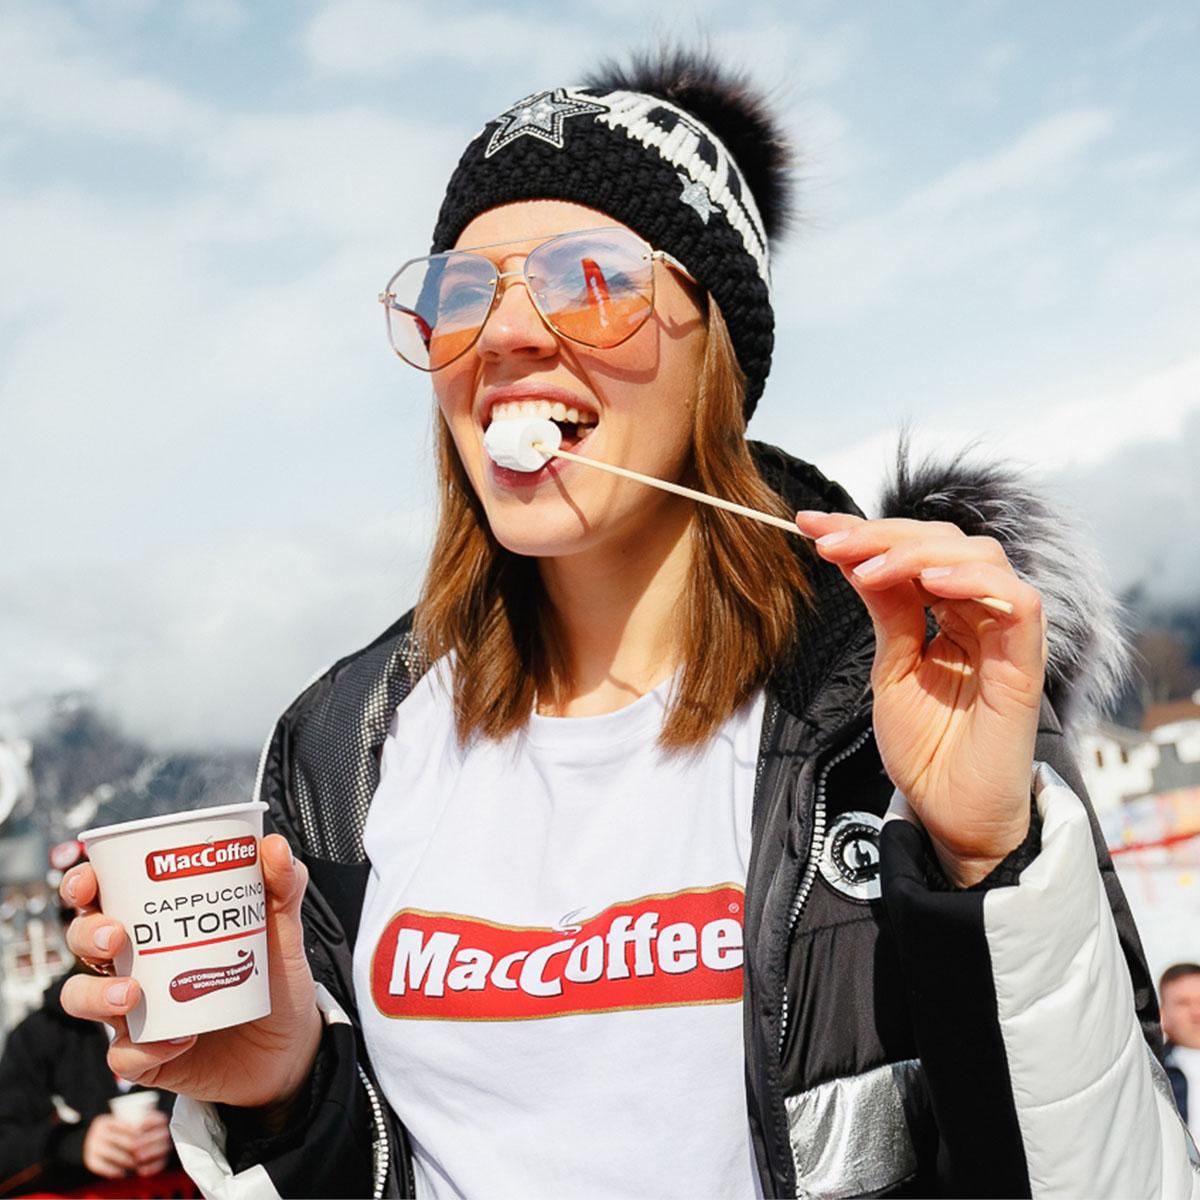 MacCoffee Cappuccino di Torino – как мы зажгли на Boogel Woogel.